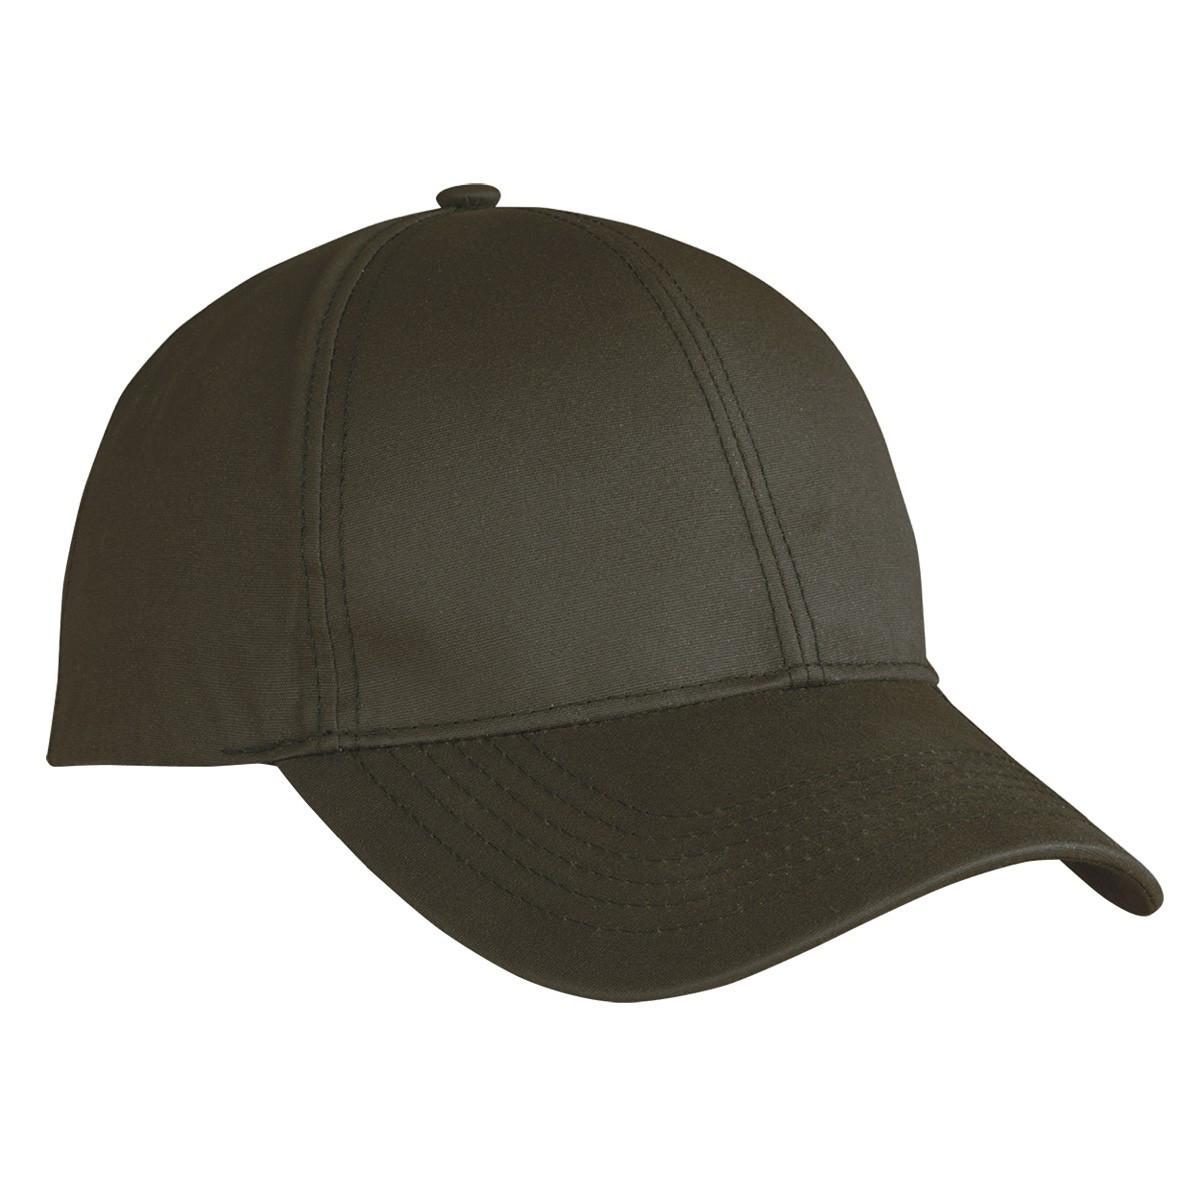 Oilskin Structured Baseball Cap c601bb6e72d